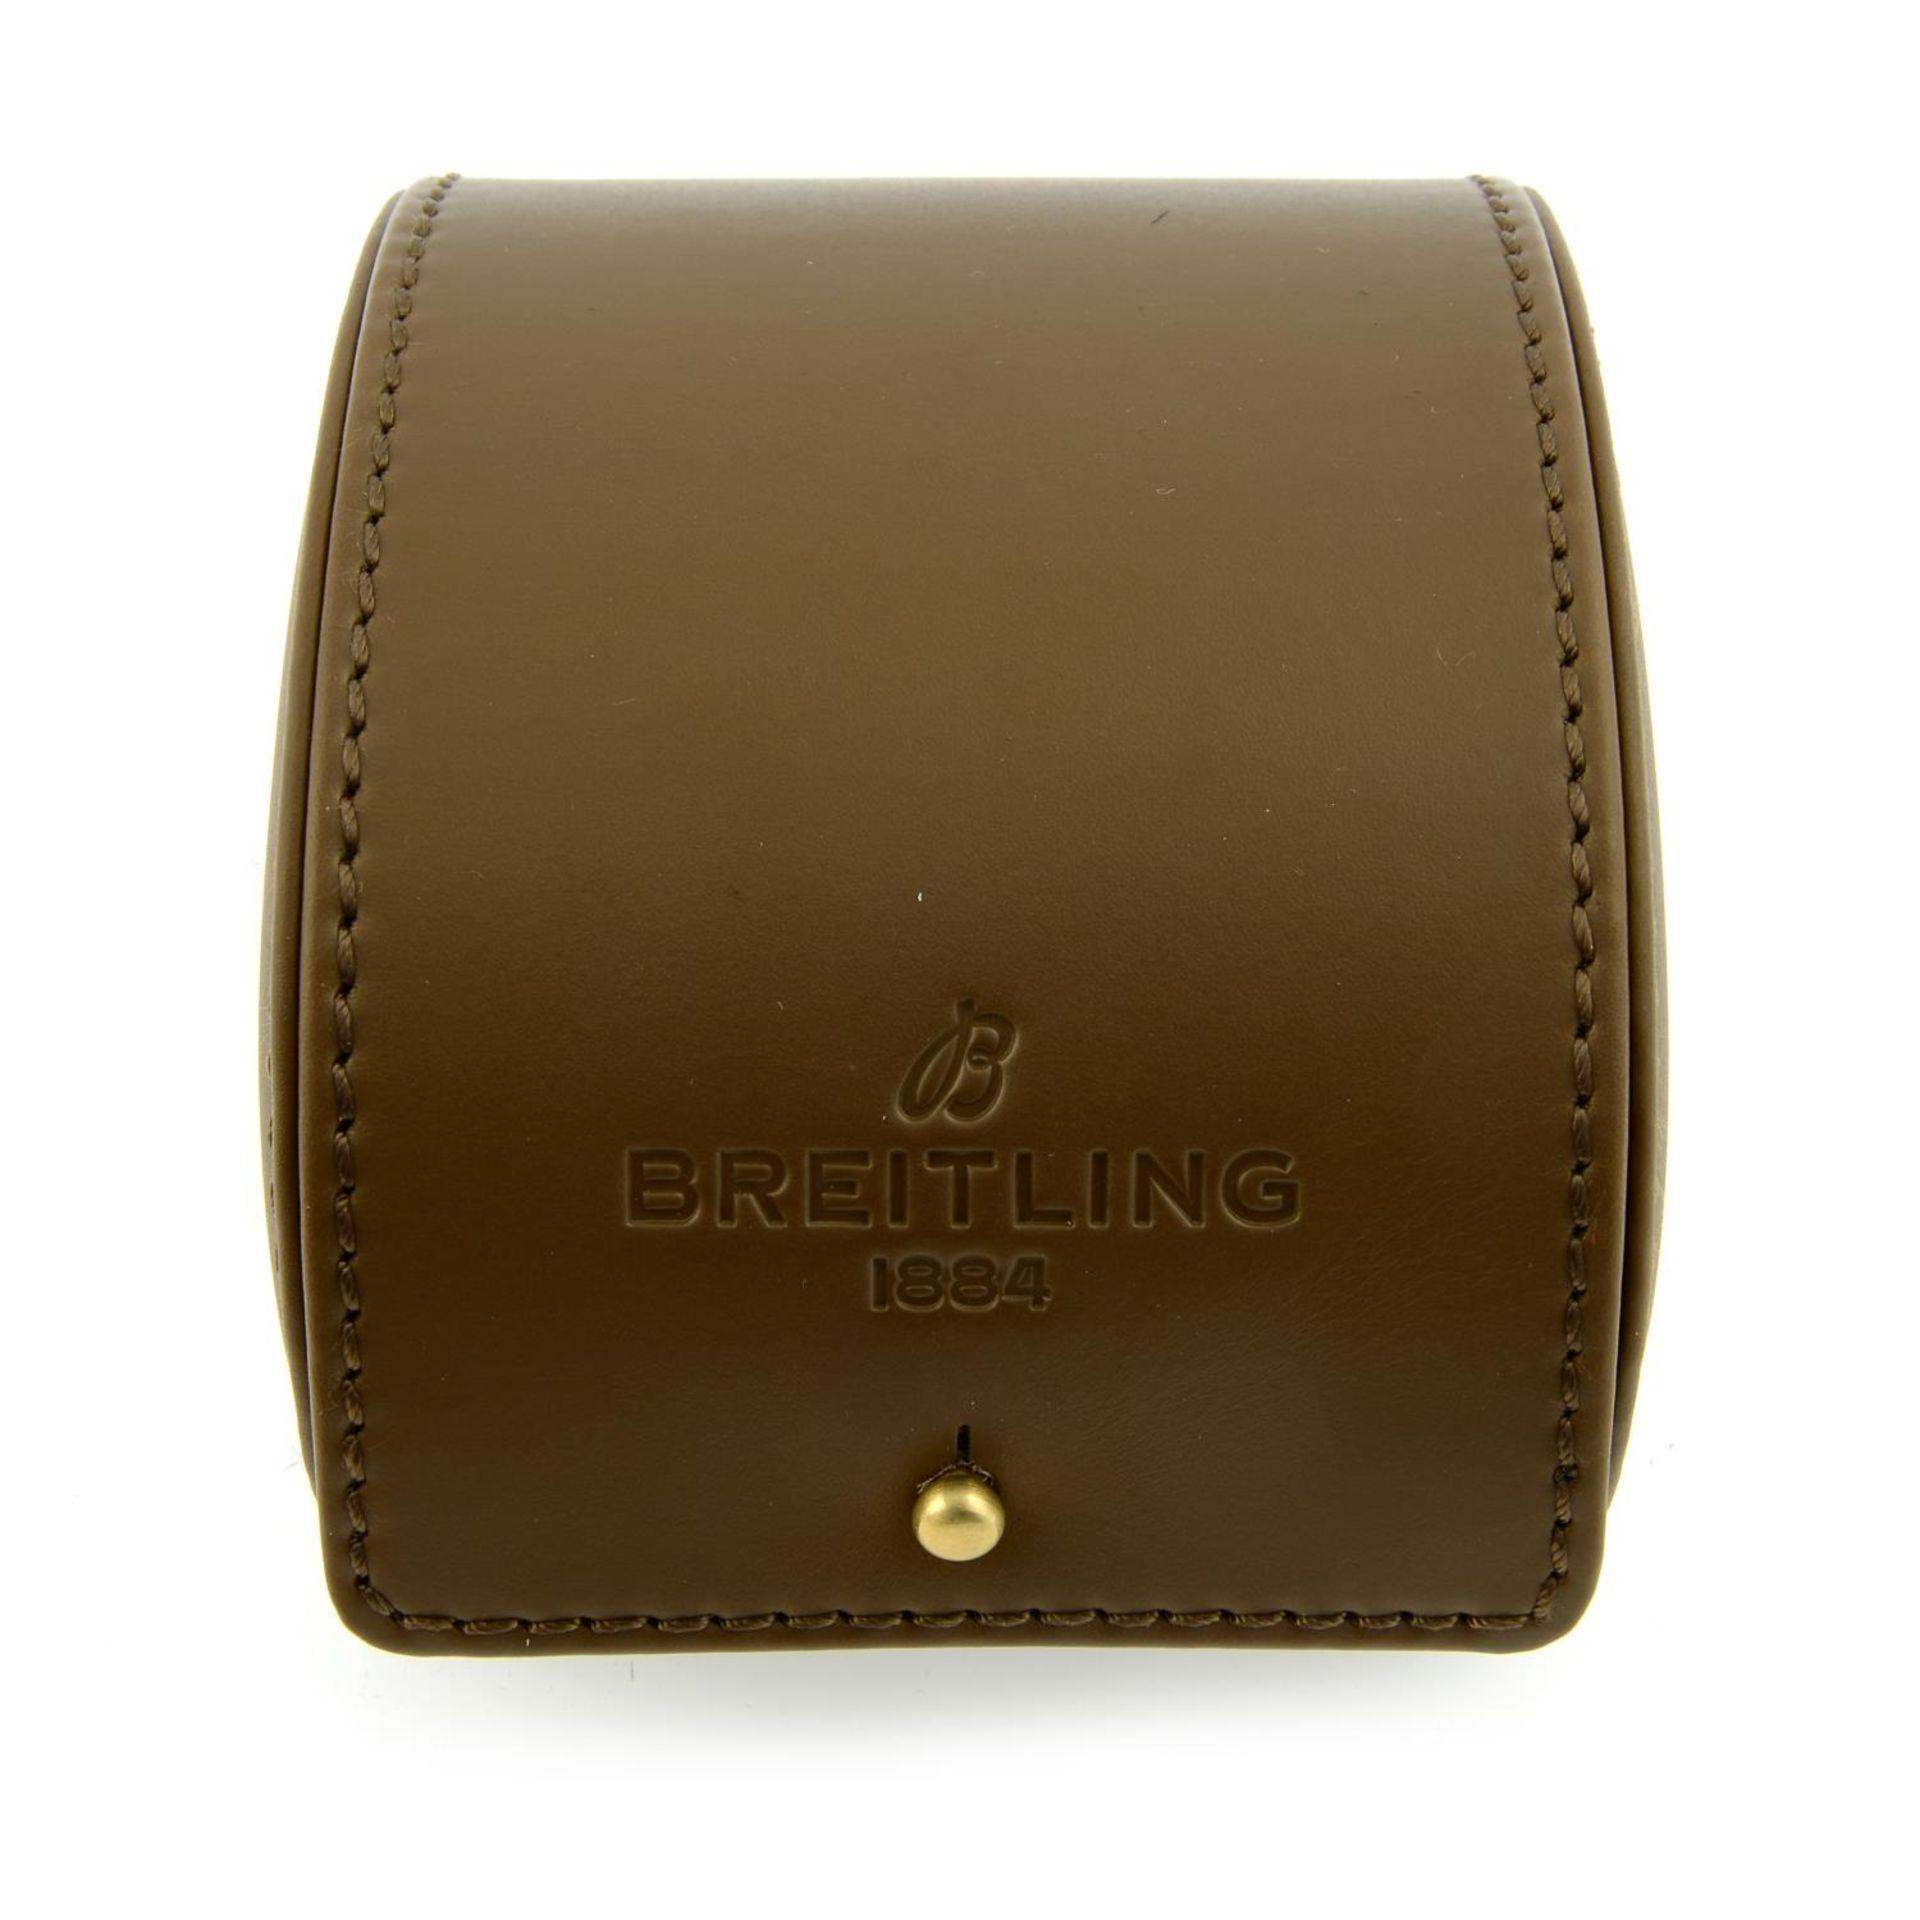 CURRENT MODEL: BREITLING - an Aviator 8 chronograph bracelet watch. - Bild 6 aus 6